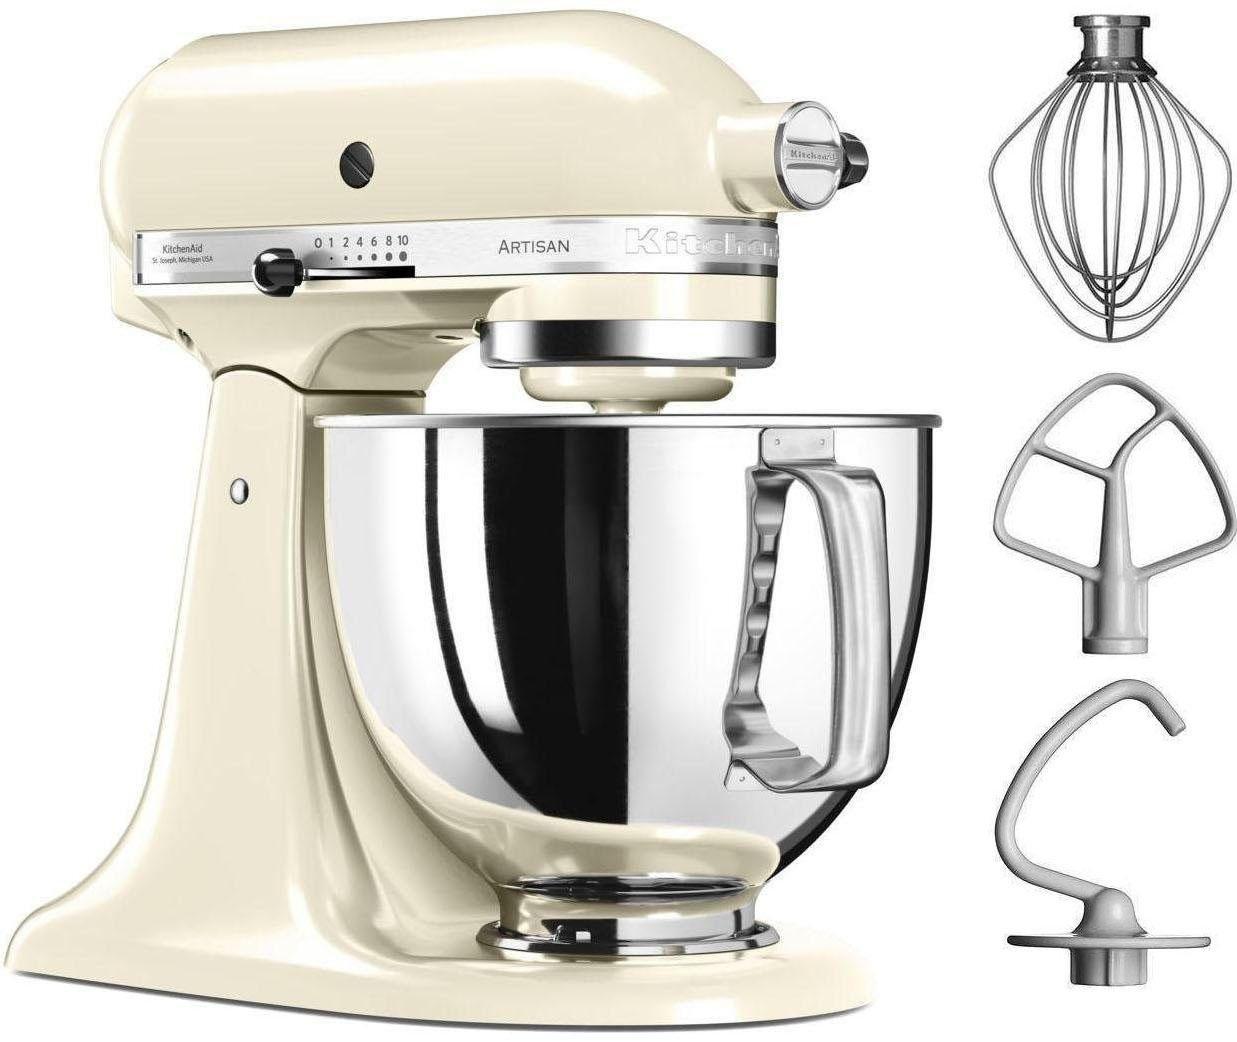 KitchenAid ® keukenmachine Artisan 5KSM125EAC, 4,8 liter, 300 W, crème bij OTTO online kopen